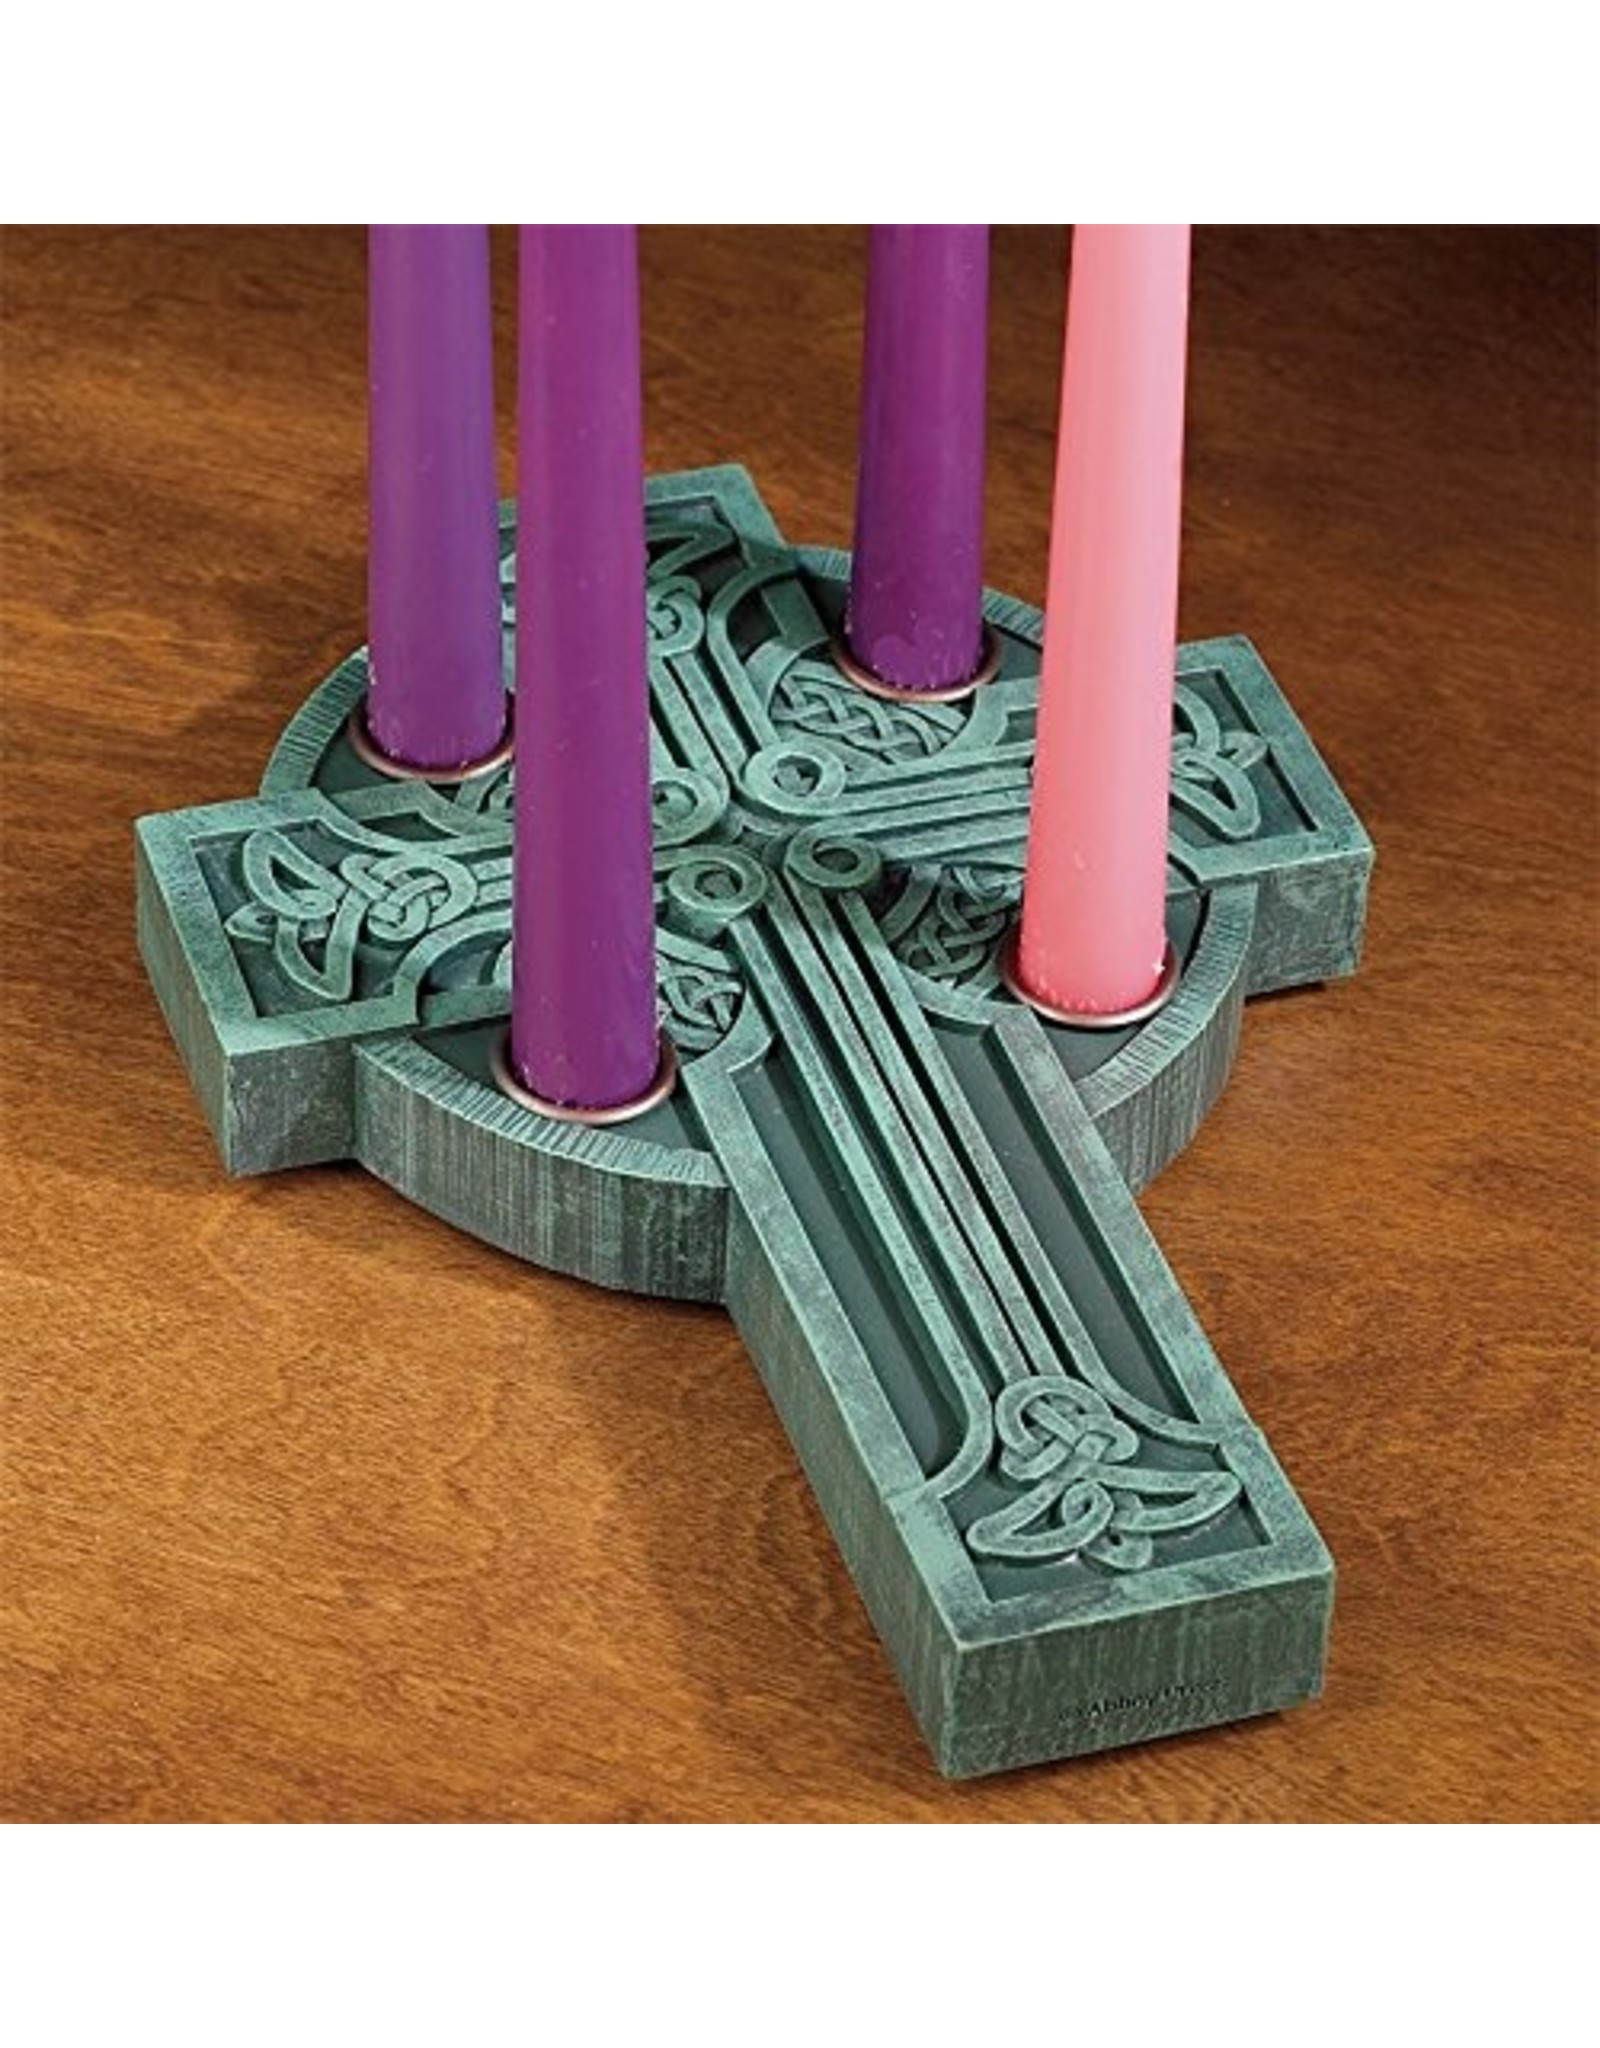 Advent Wreath (Candleholder) - Celtic Cross